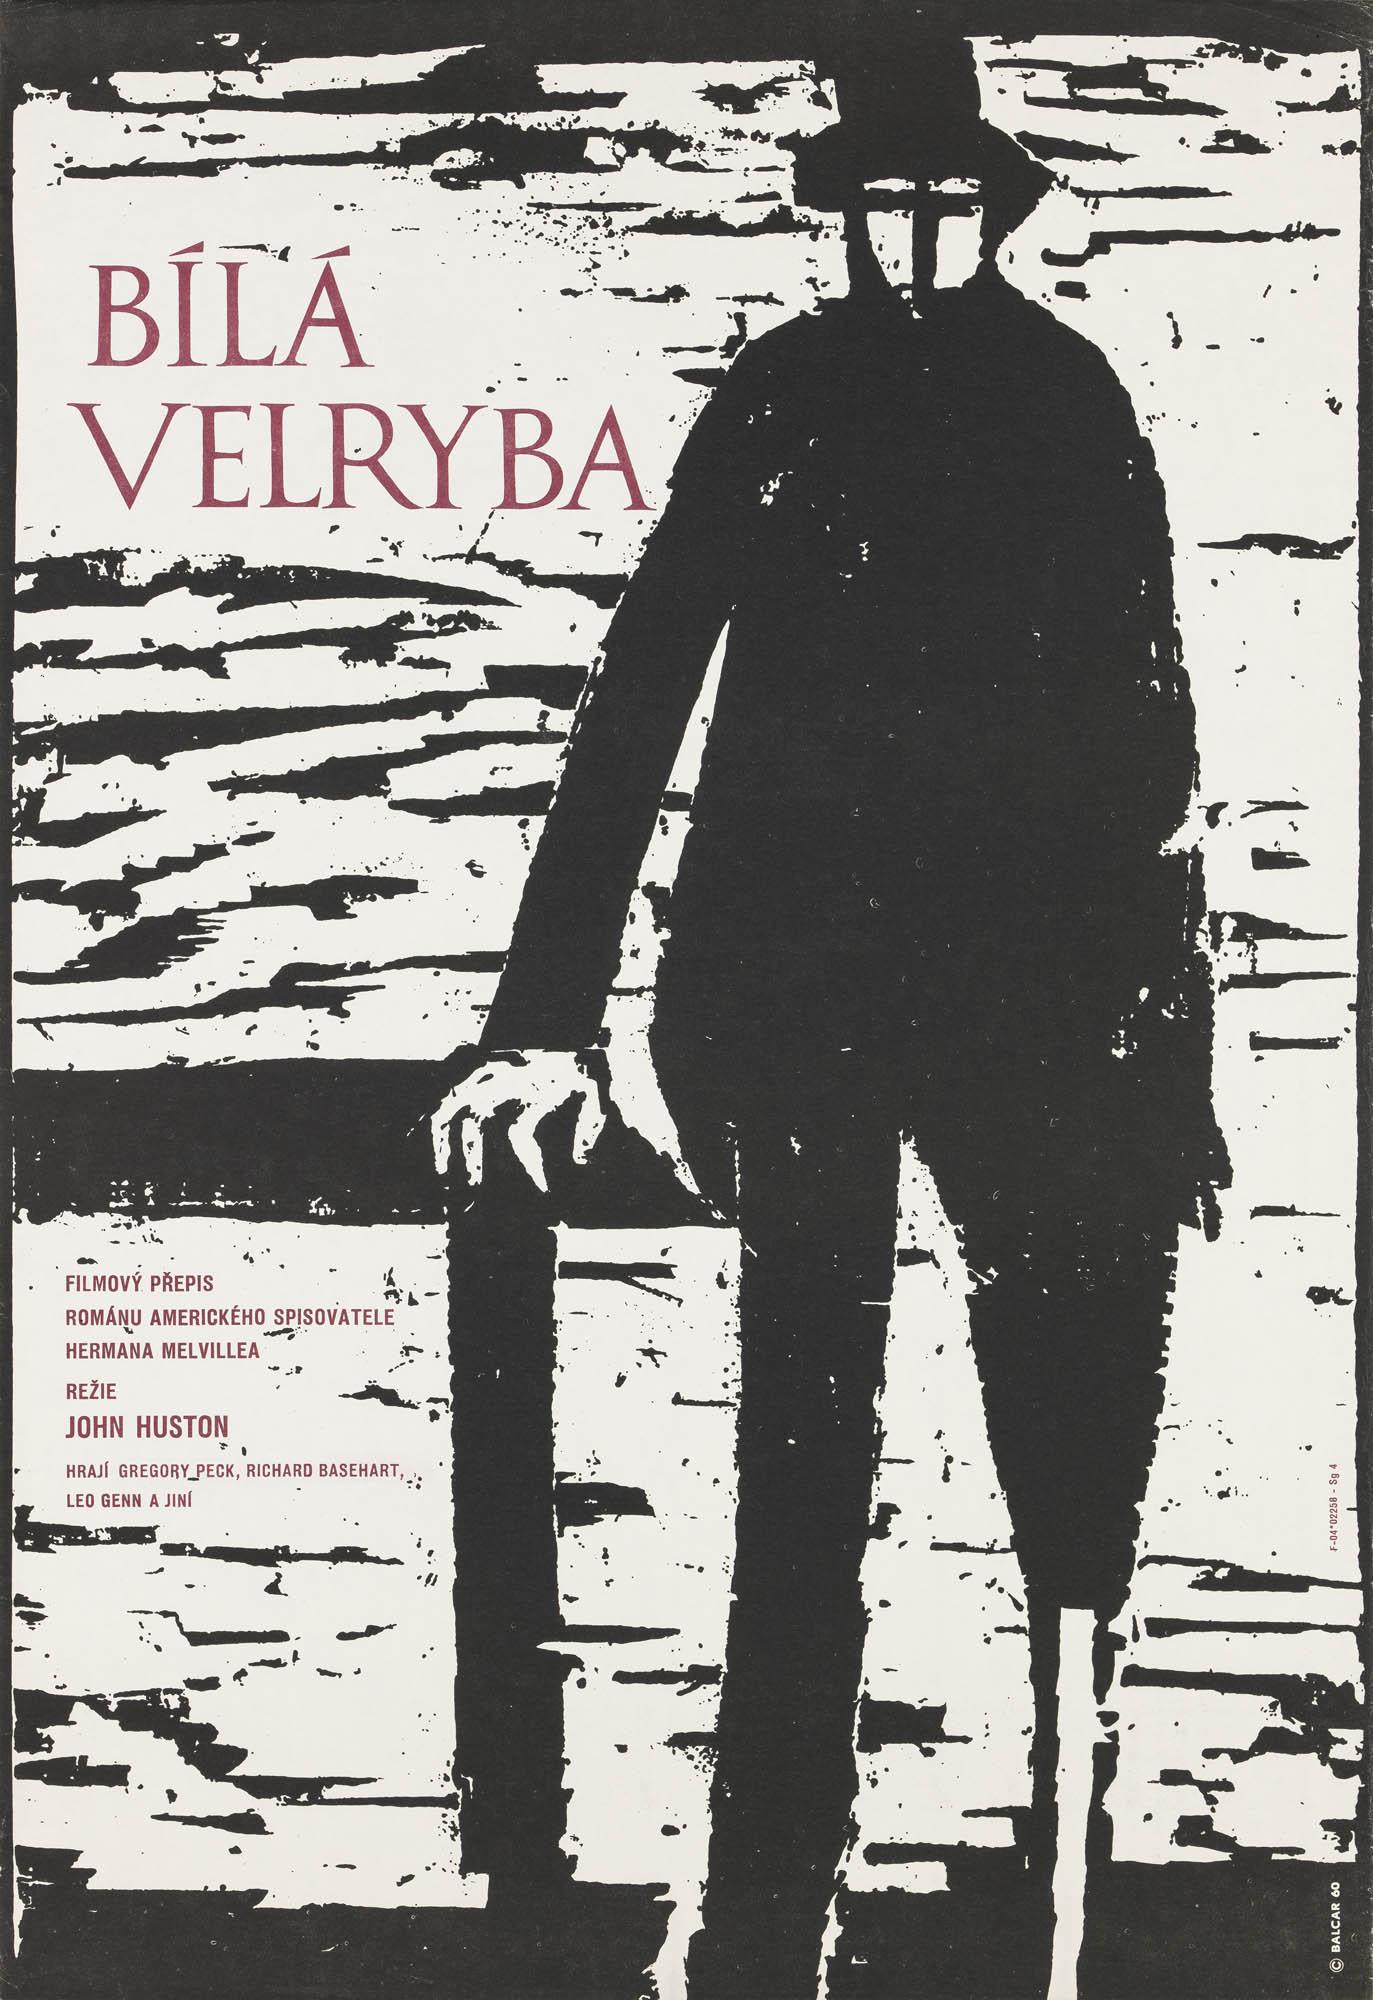 Moby Dick Antonio Reboiro Poster